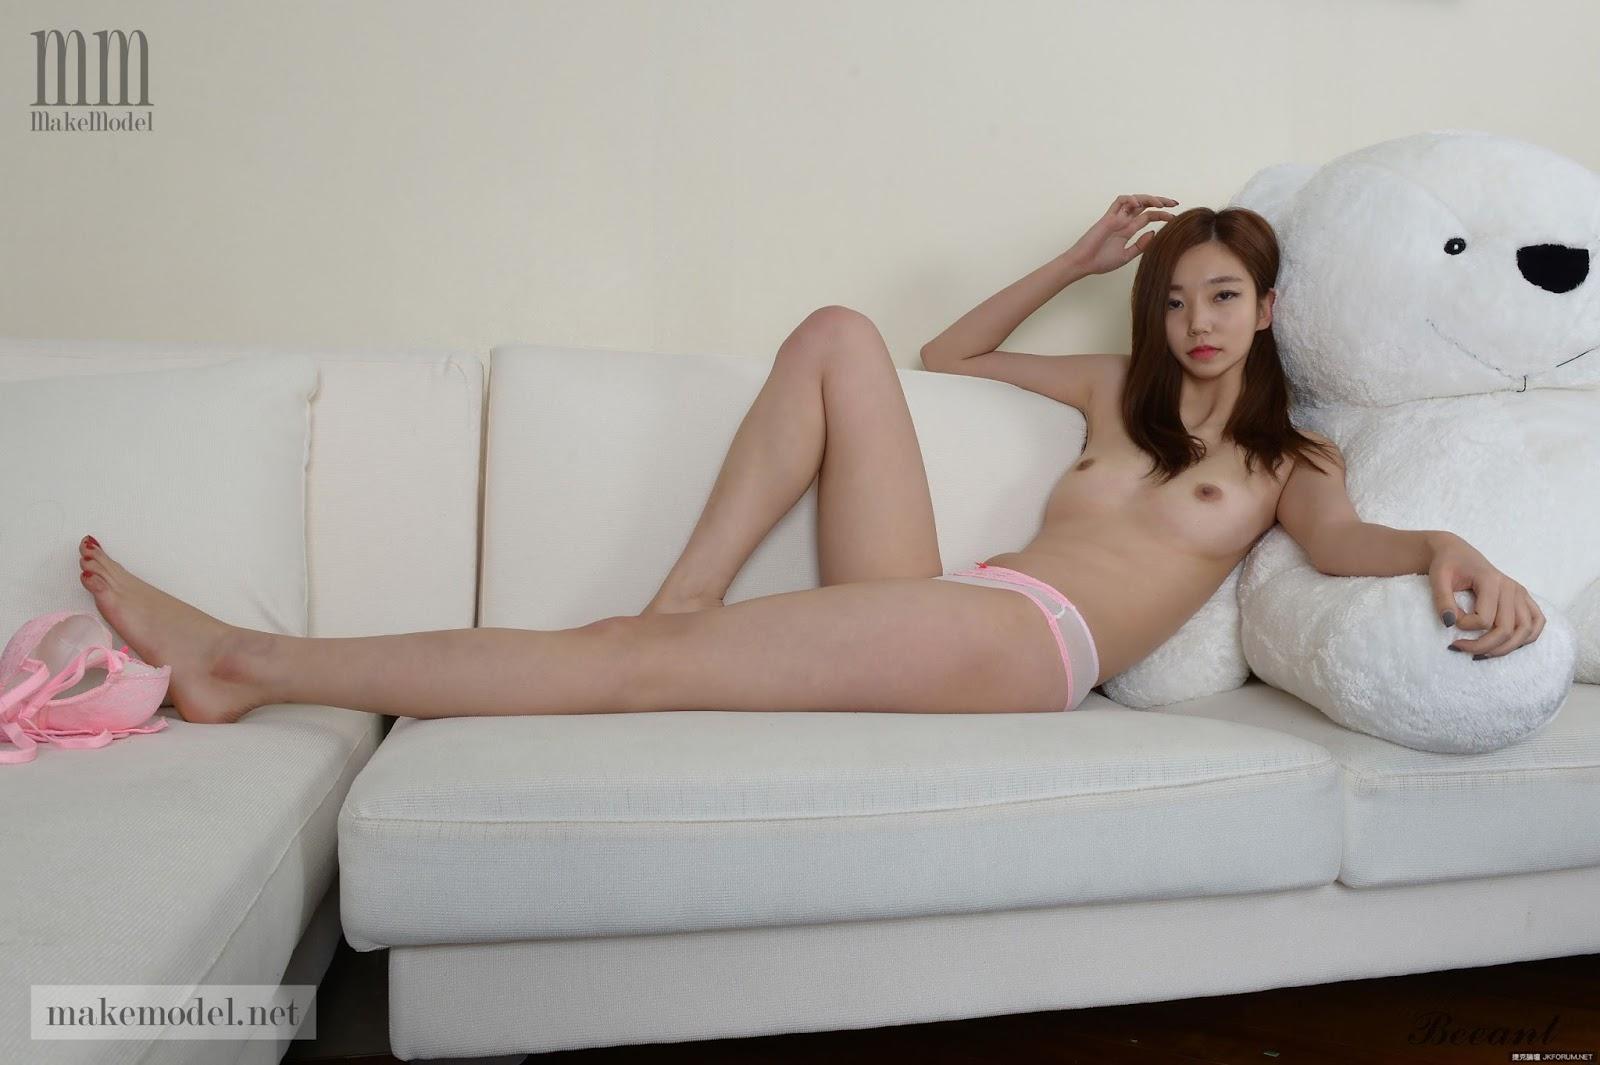 270912 3454%2B%25282%2529 - Korean Nude - Big Albom Remain #A-korean girl